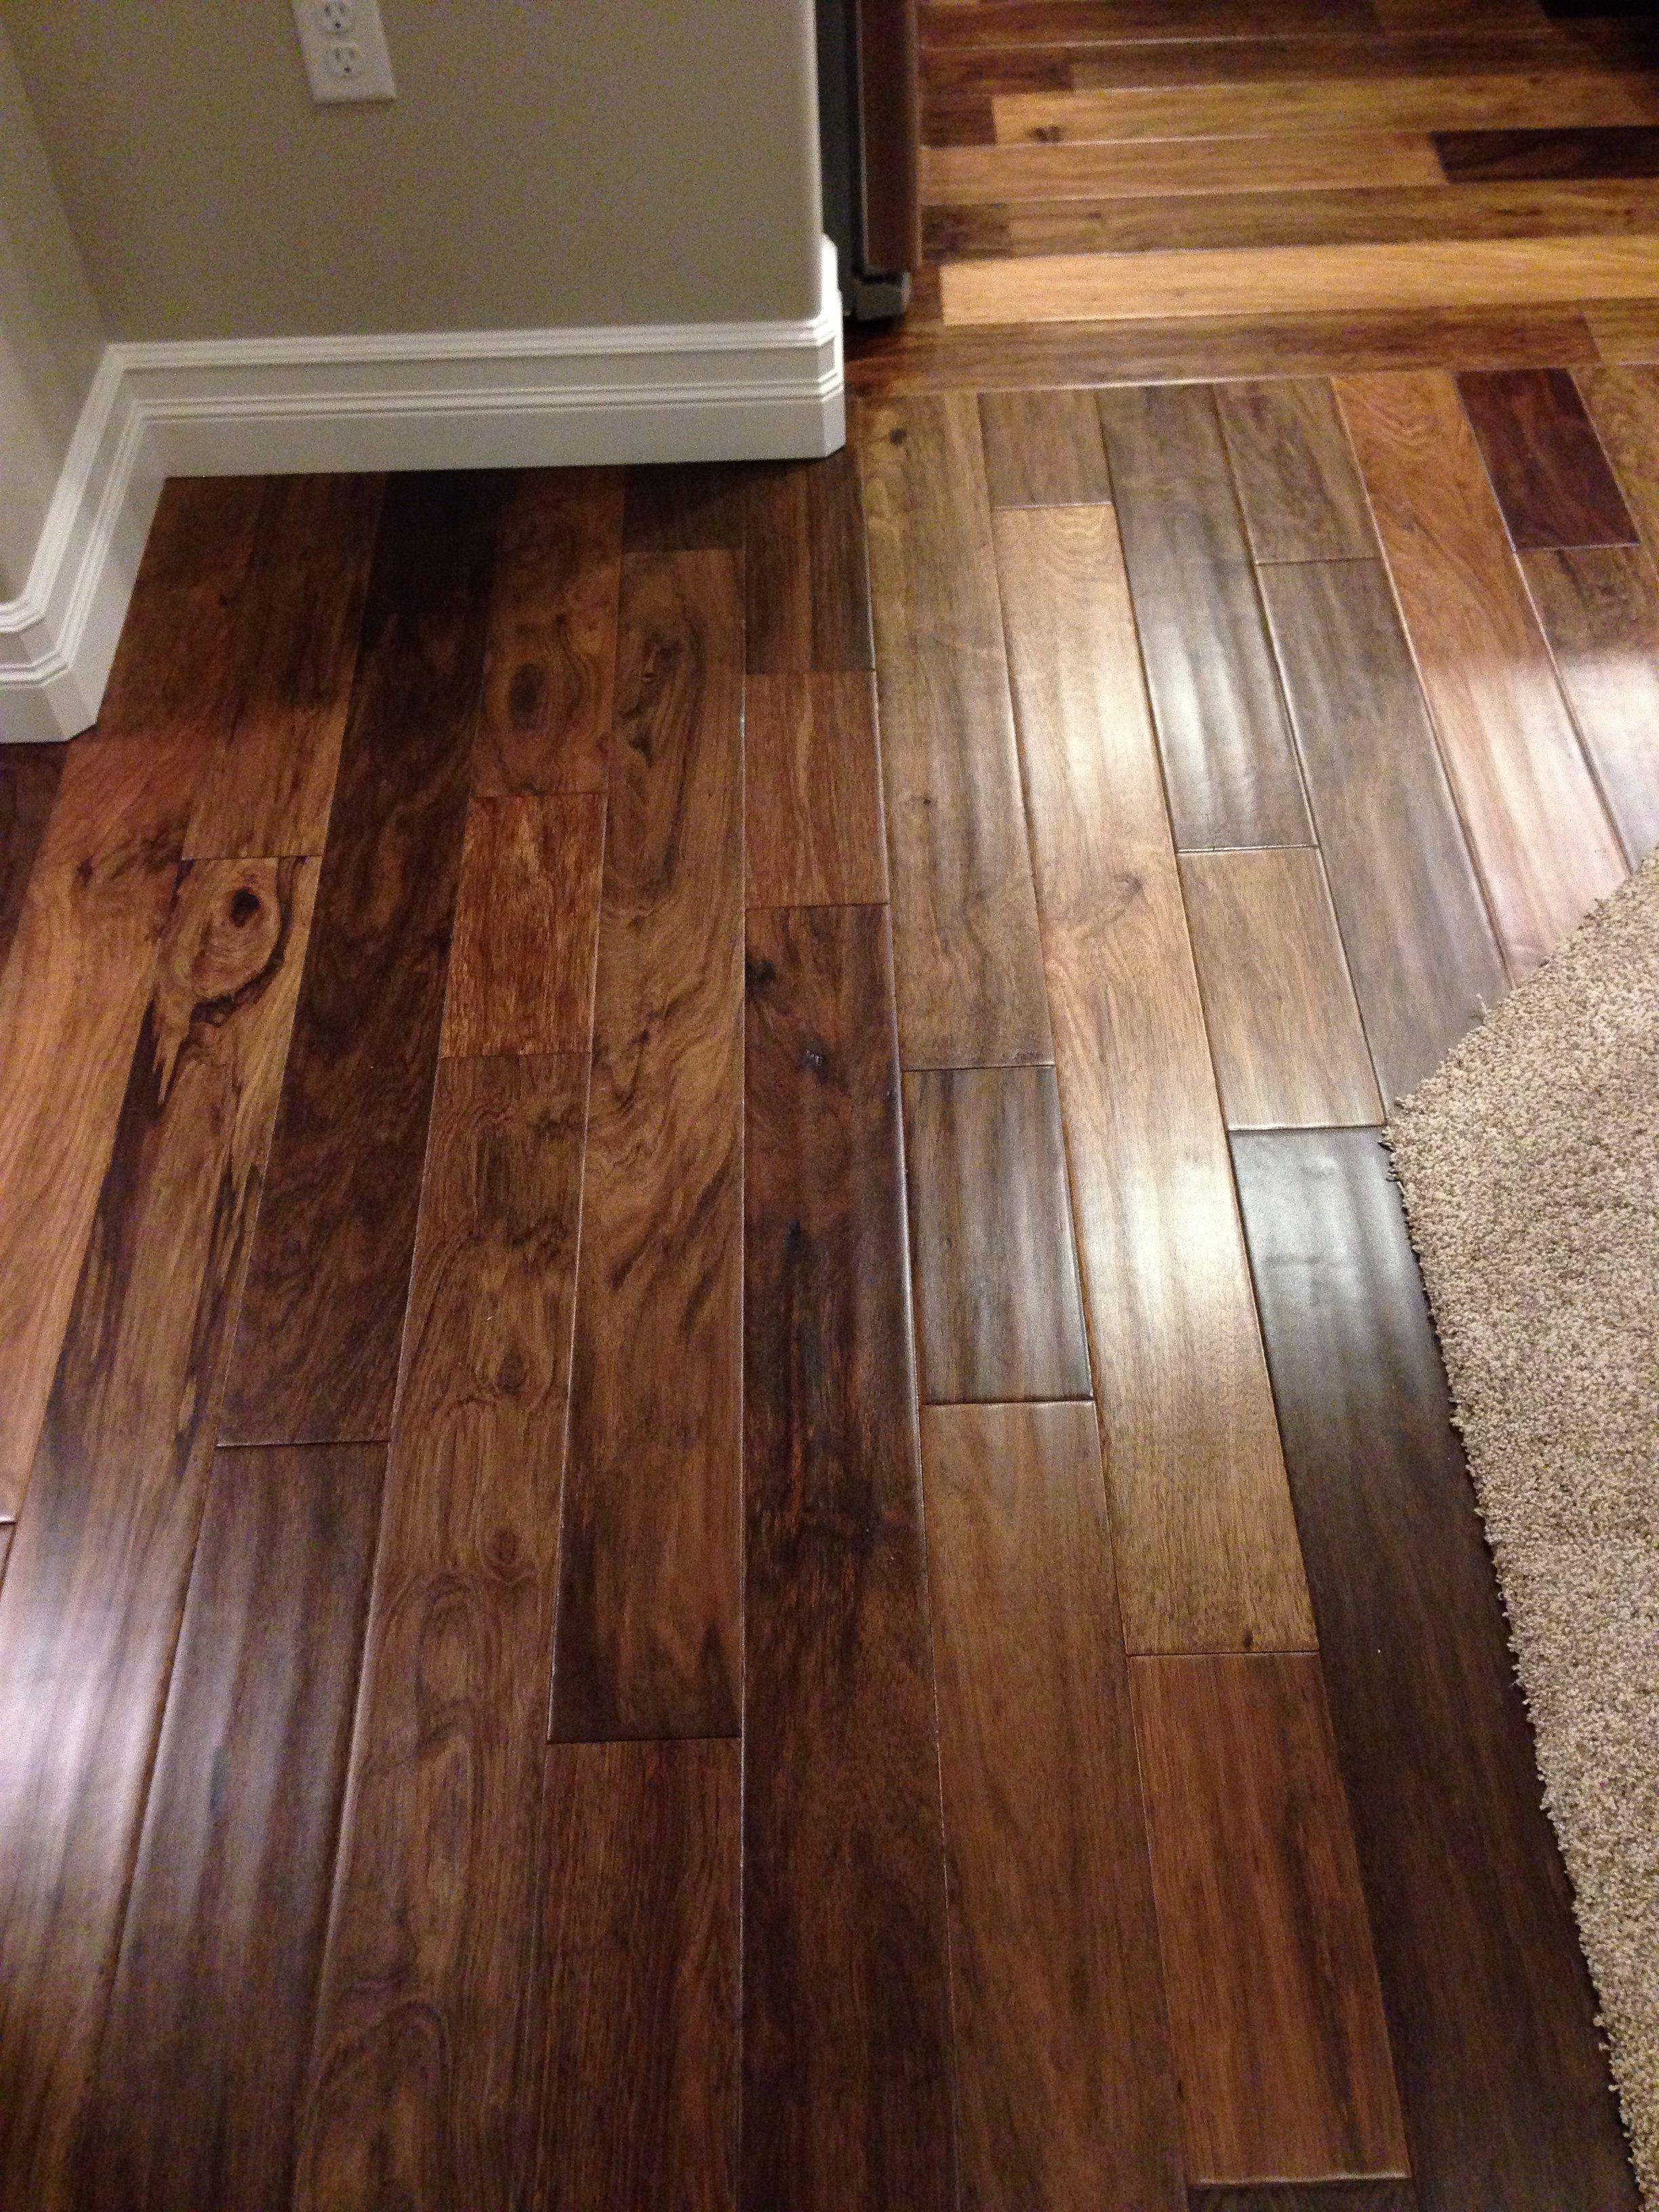 room uk fice floors for of wood floor bathrooms with bathroom home engineered adorable flooring small fresh luxury